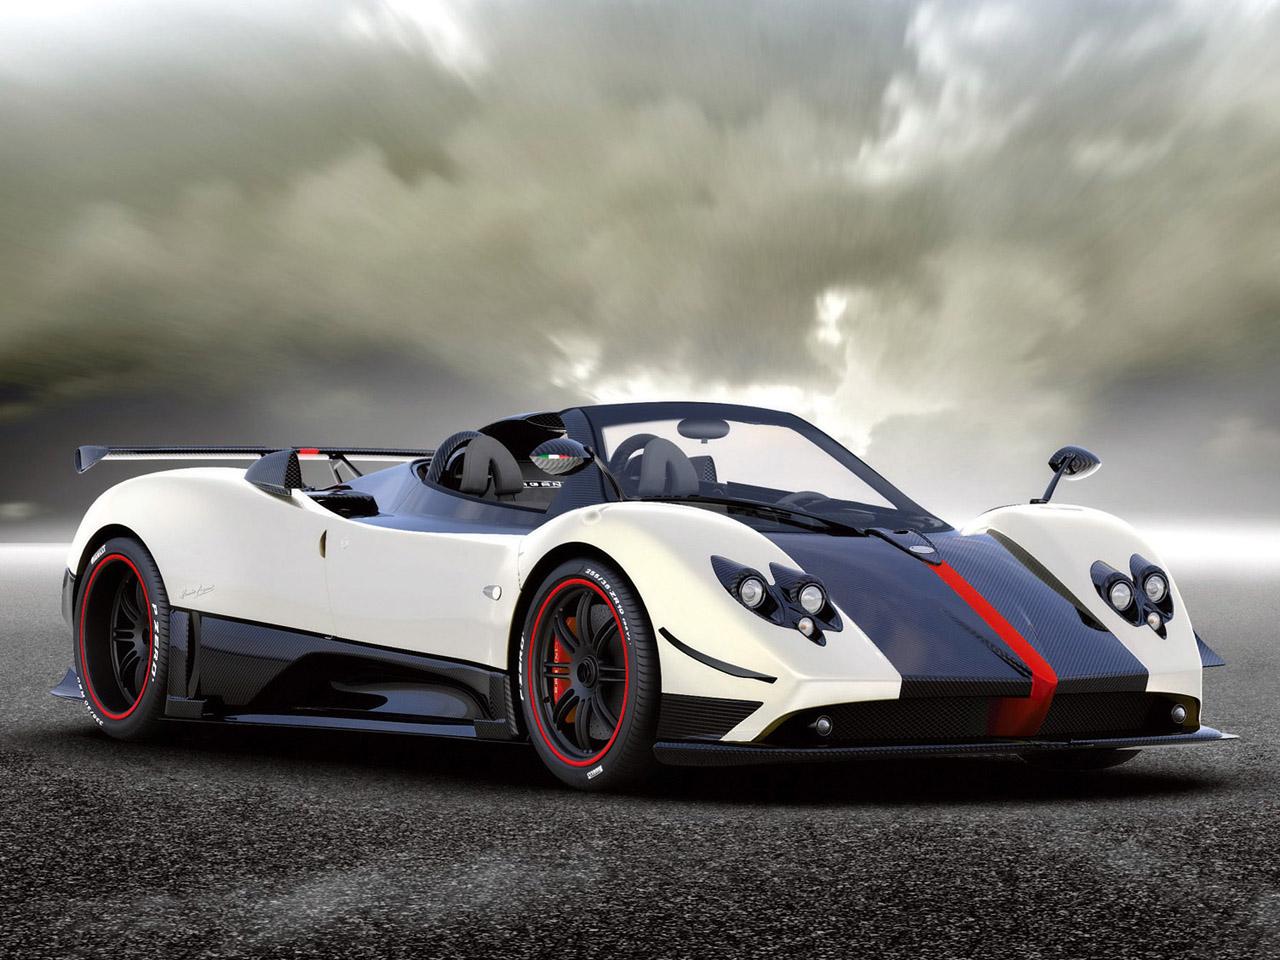 Melkyaditya.blogspot.com: Most Expensive Cars In The World